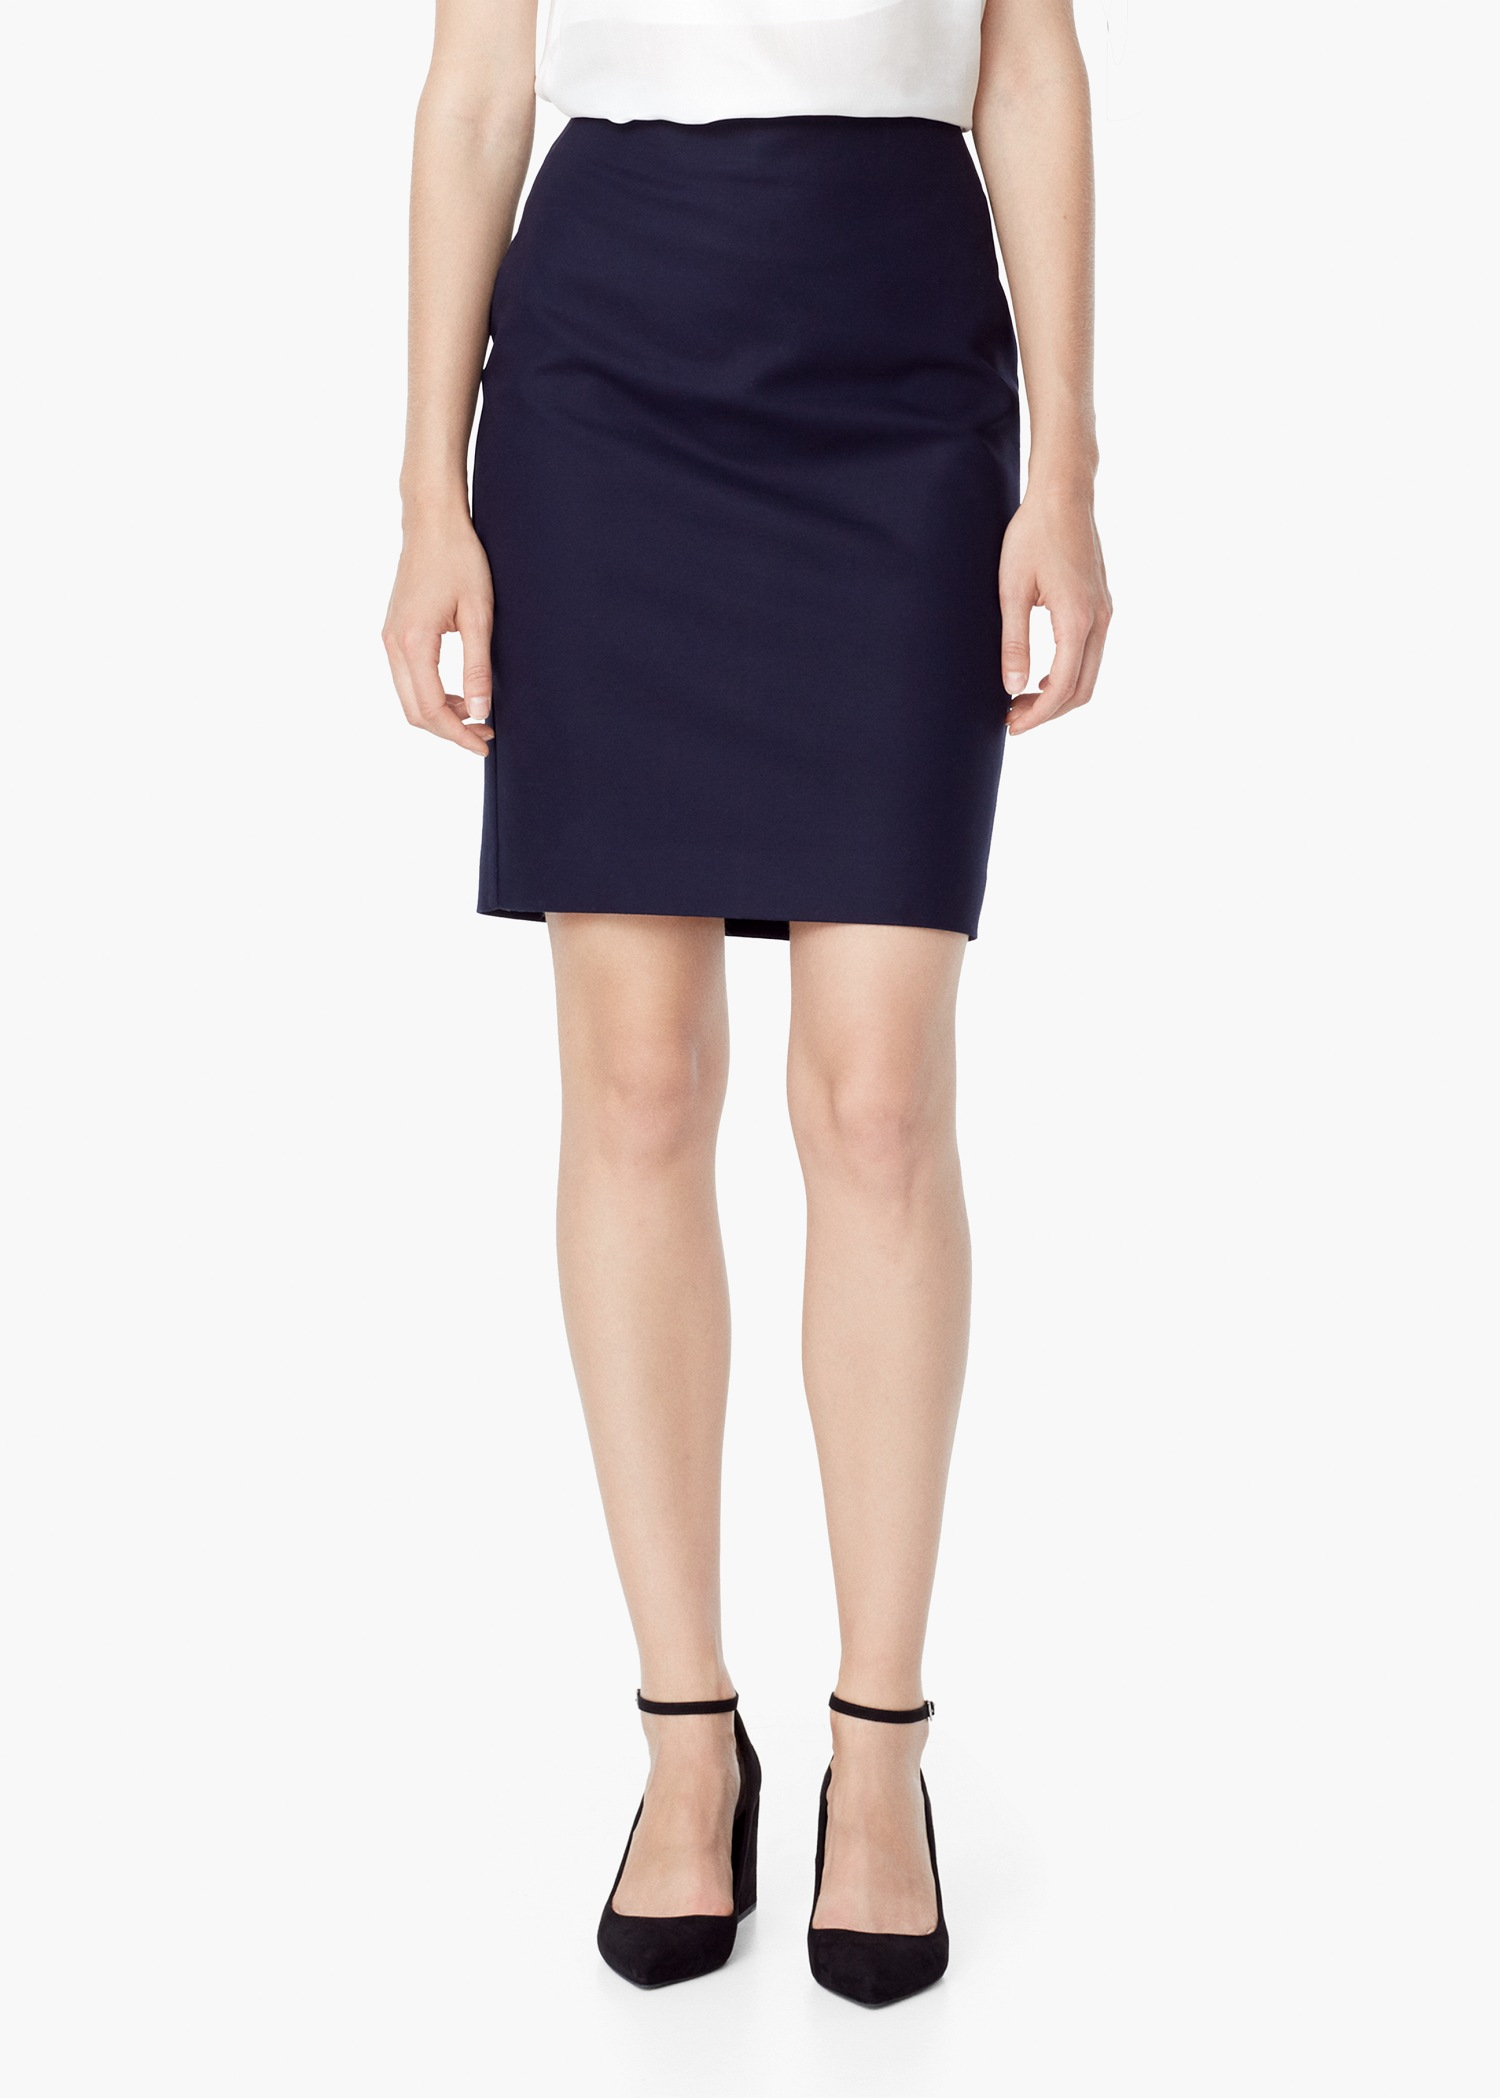 Cotton Pencil Skirts Fashion Skirts